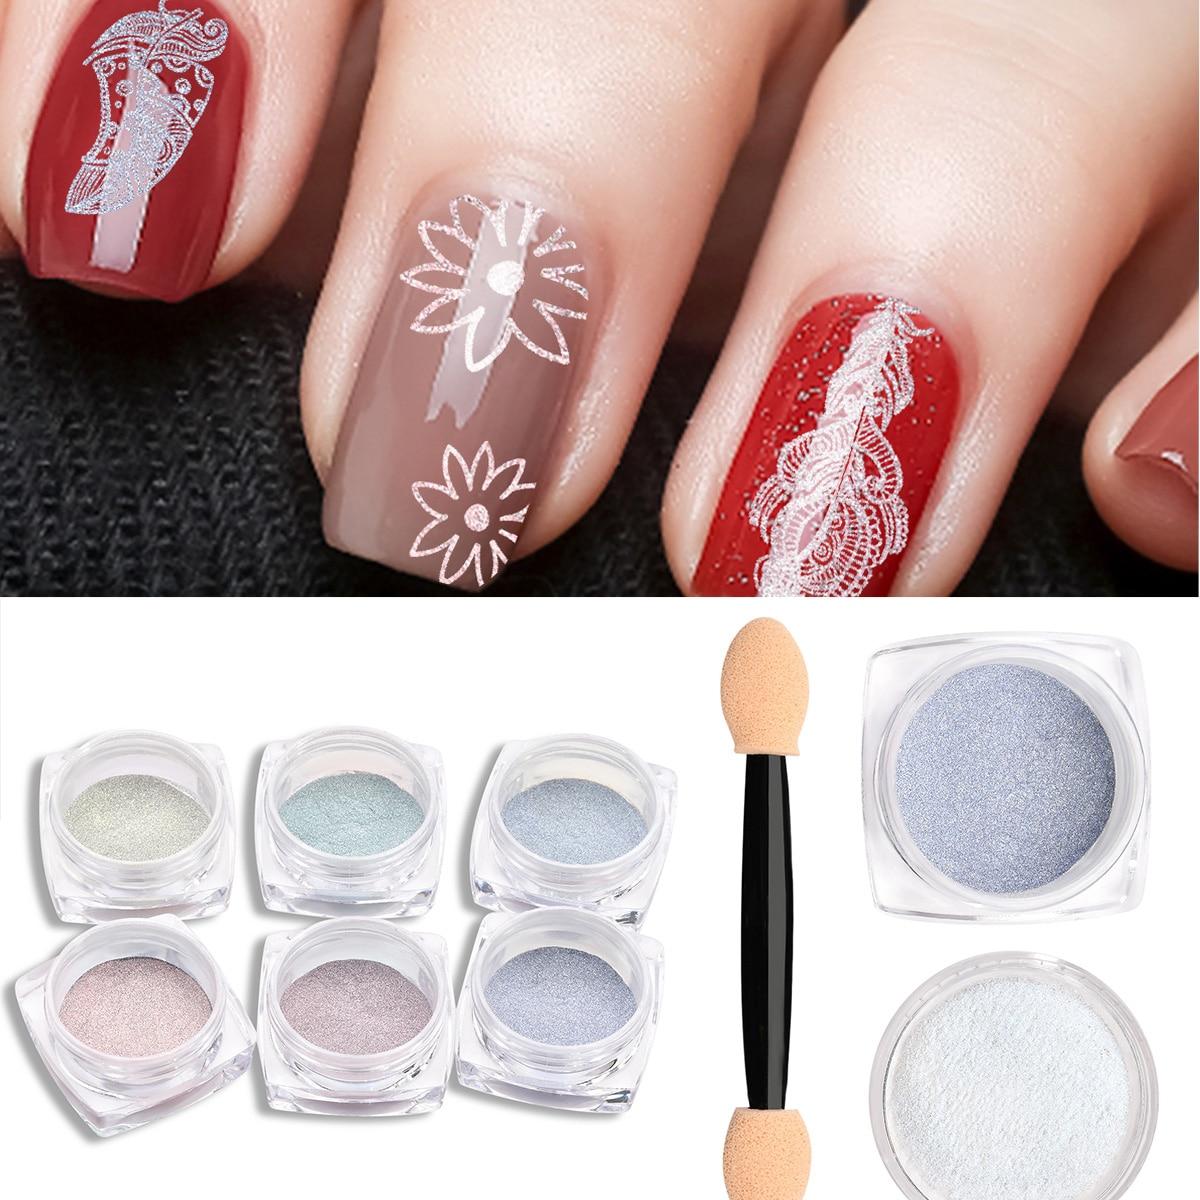 BeautyBigBang 0,2g brillo de uñas sirena perla pigmento brillante láser Shell Glimmer Nail Art polvo holográfico manicura